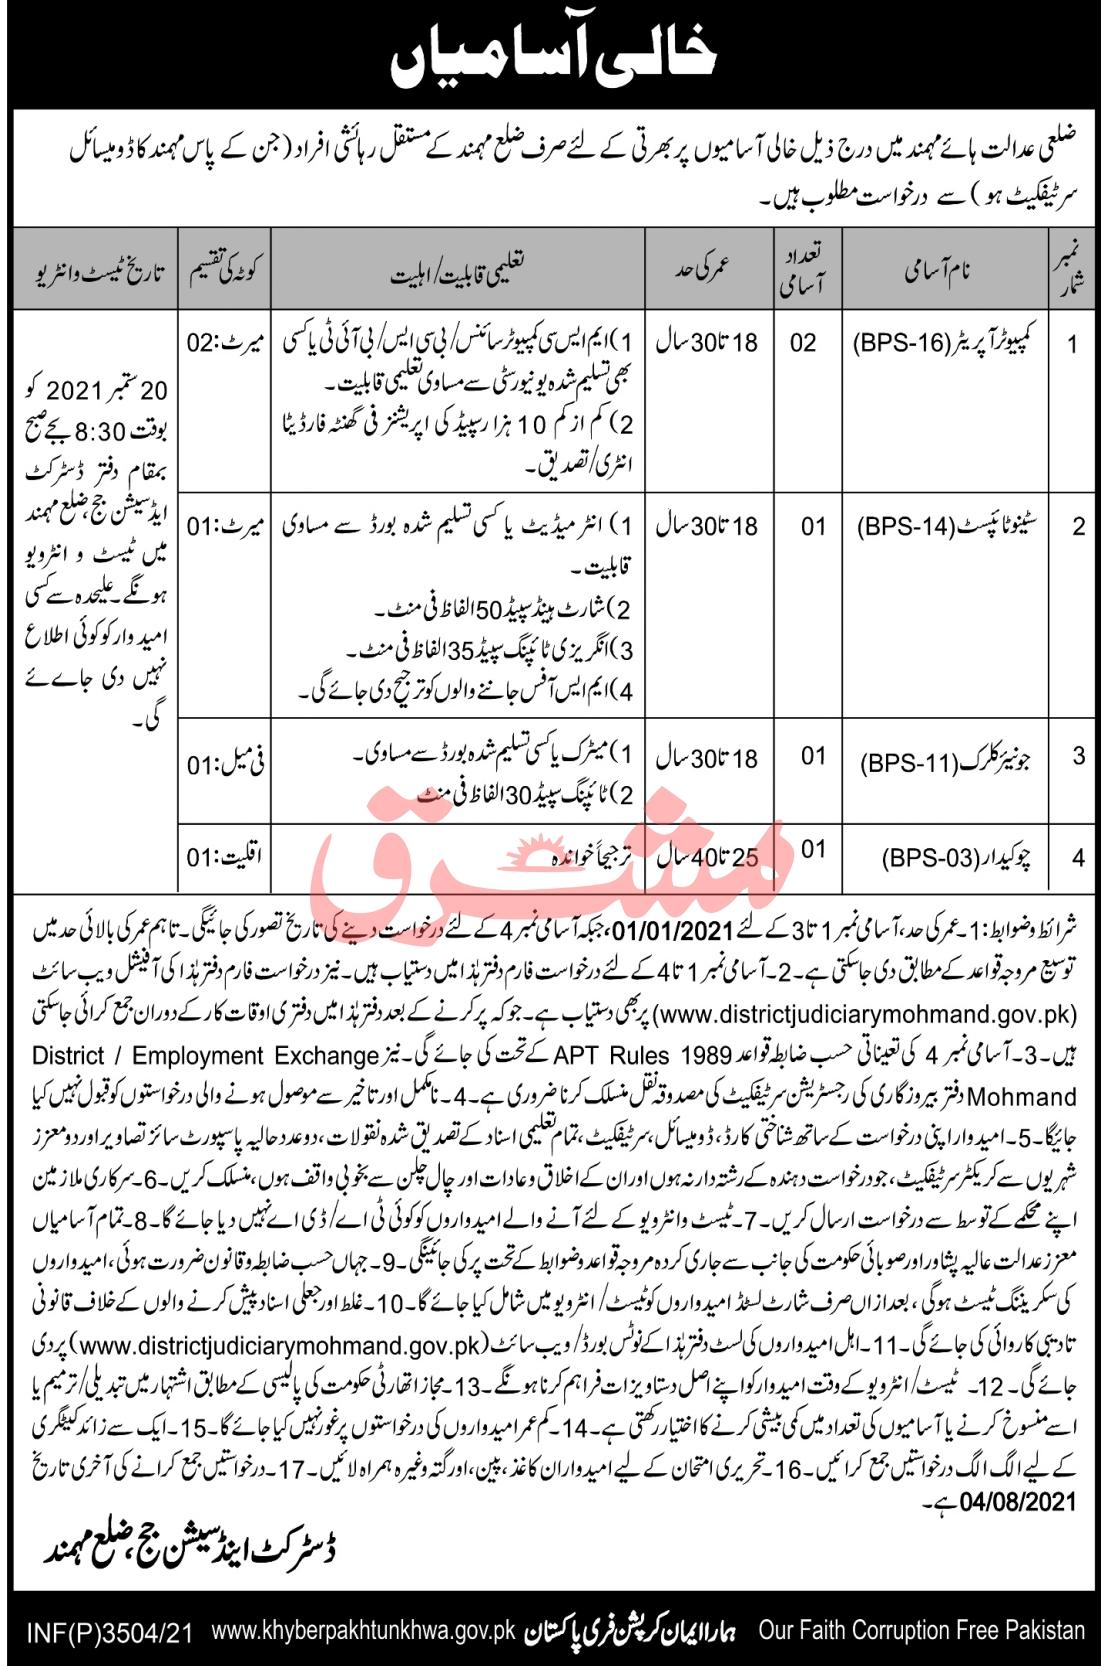 www.districtjudiciarymohmand.gov.pk Jobs 2021 - District Court Mohmand Jobs 2021 in Pakistan